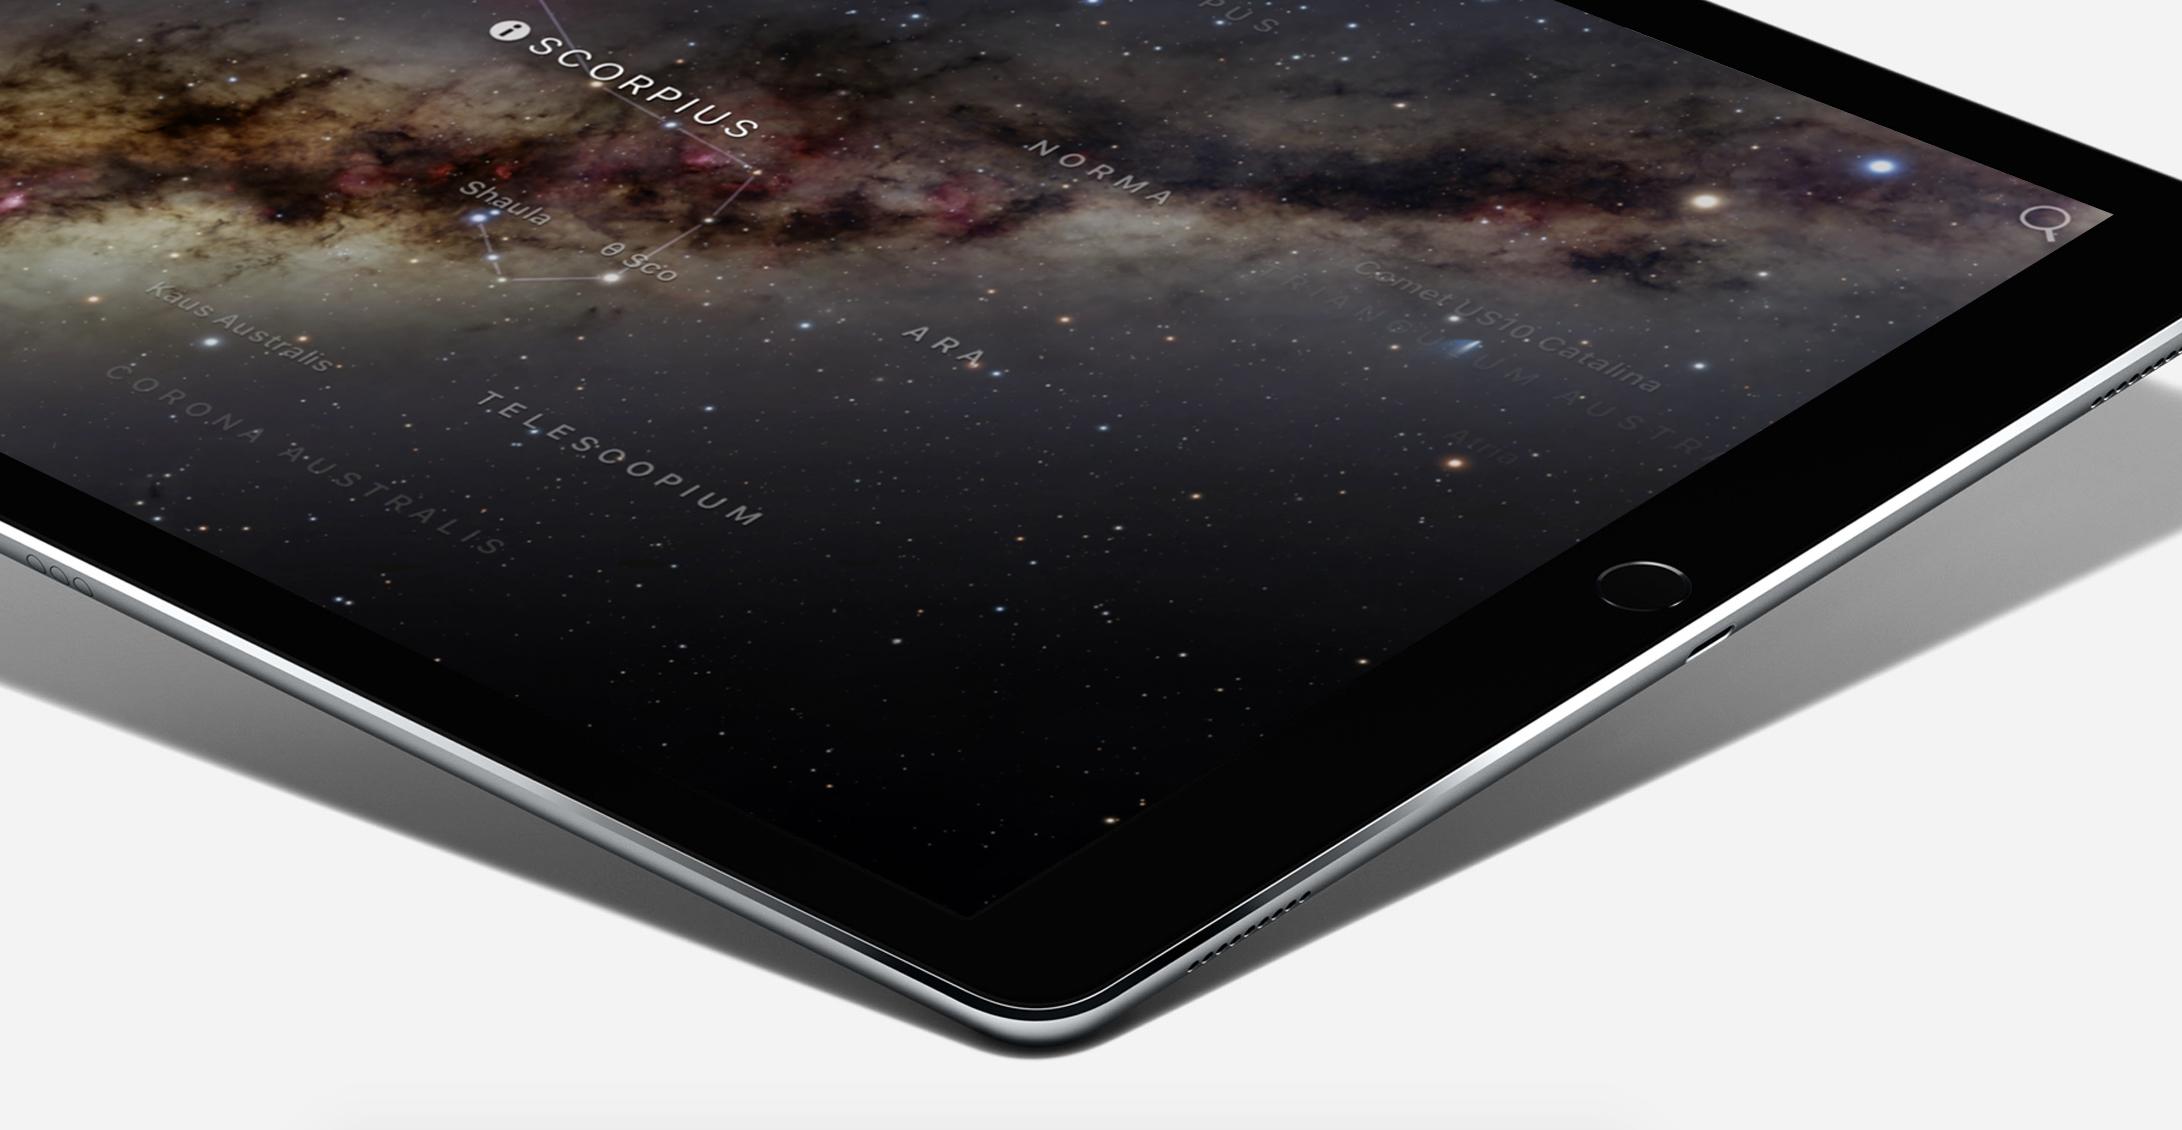 iPad Pro støtter USB 3.0-hastigheter.